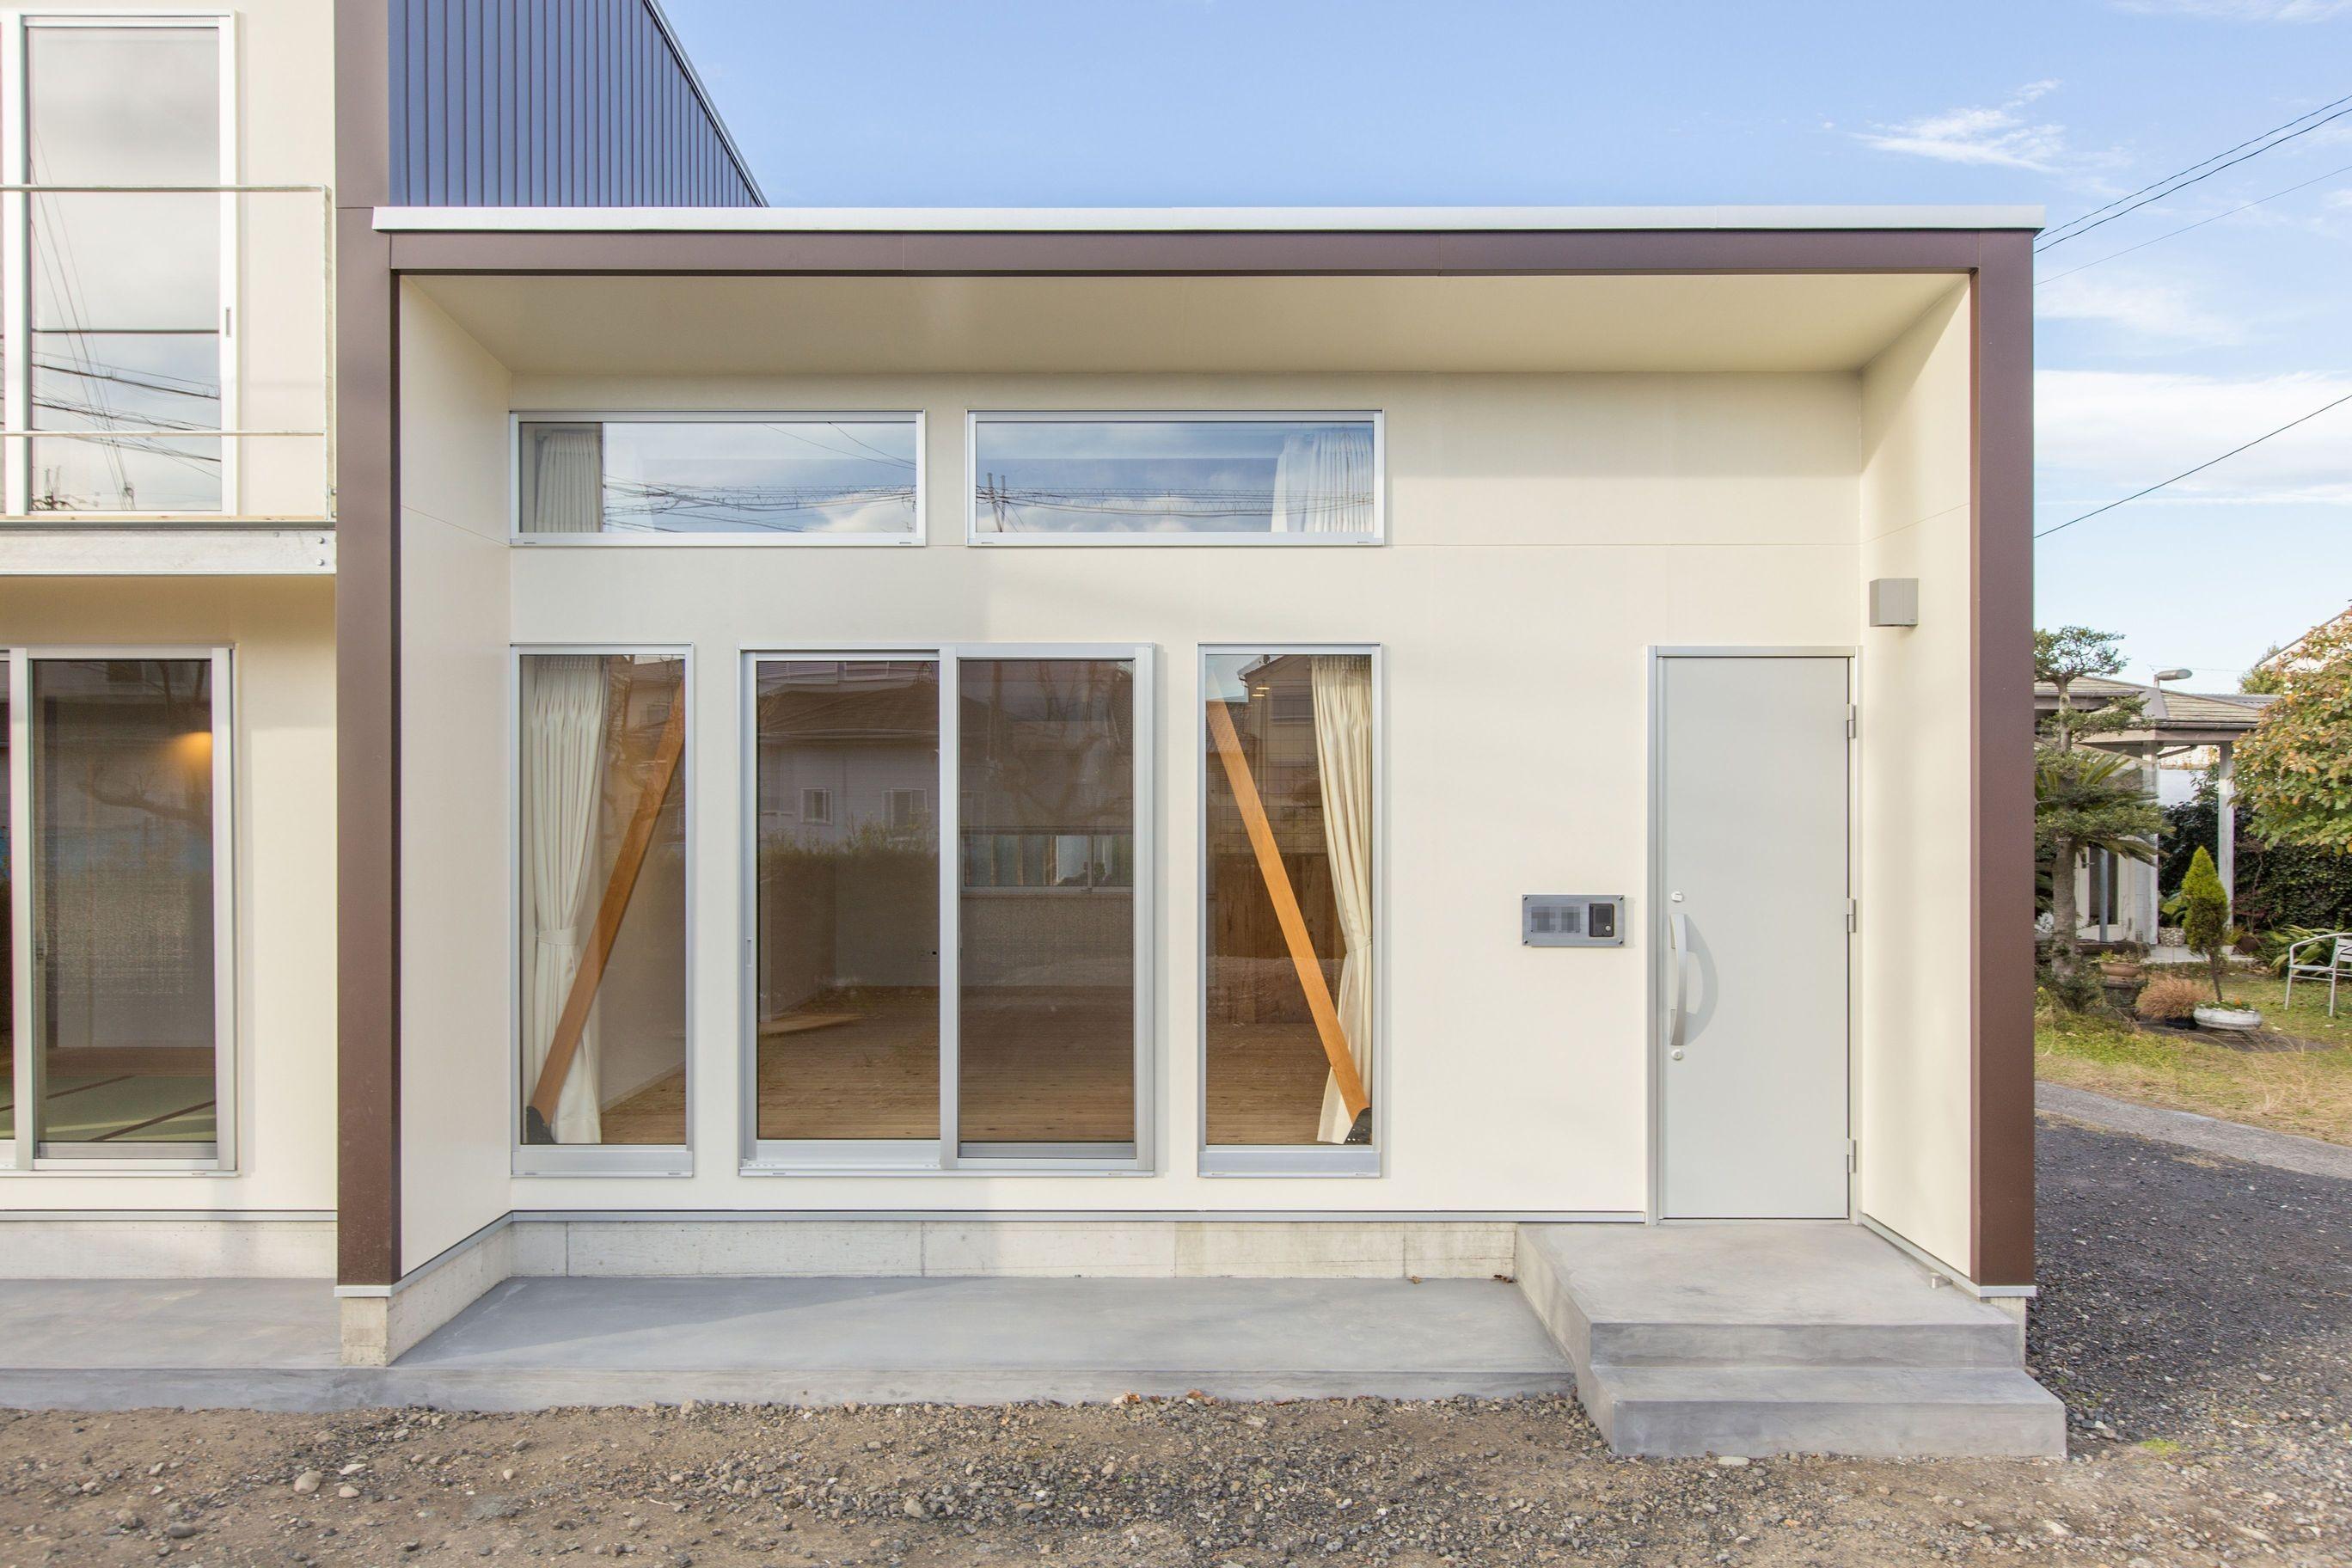 外観事例:南外観(3-BOX 1800万円の家)